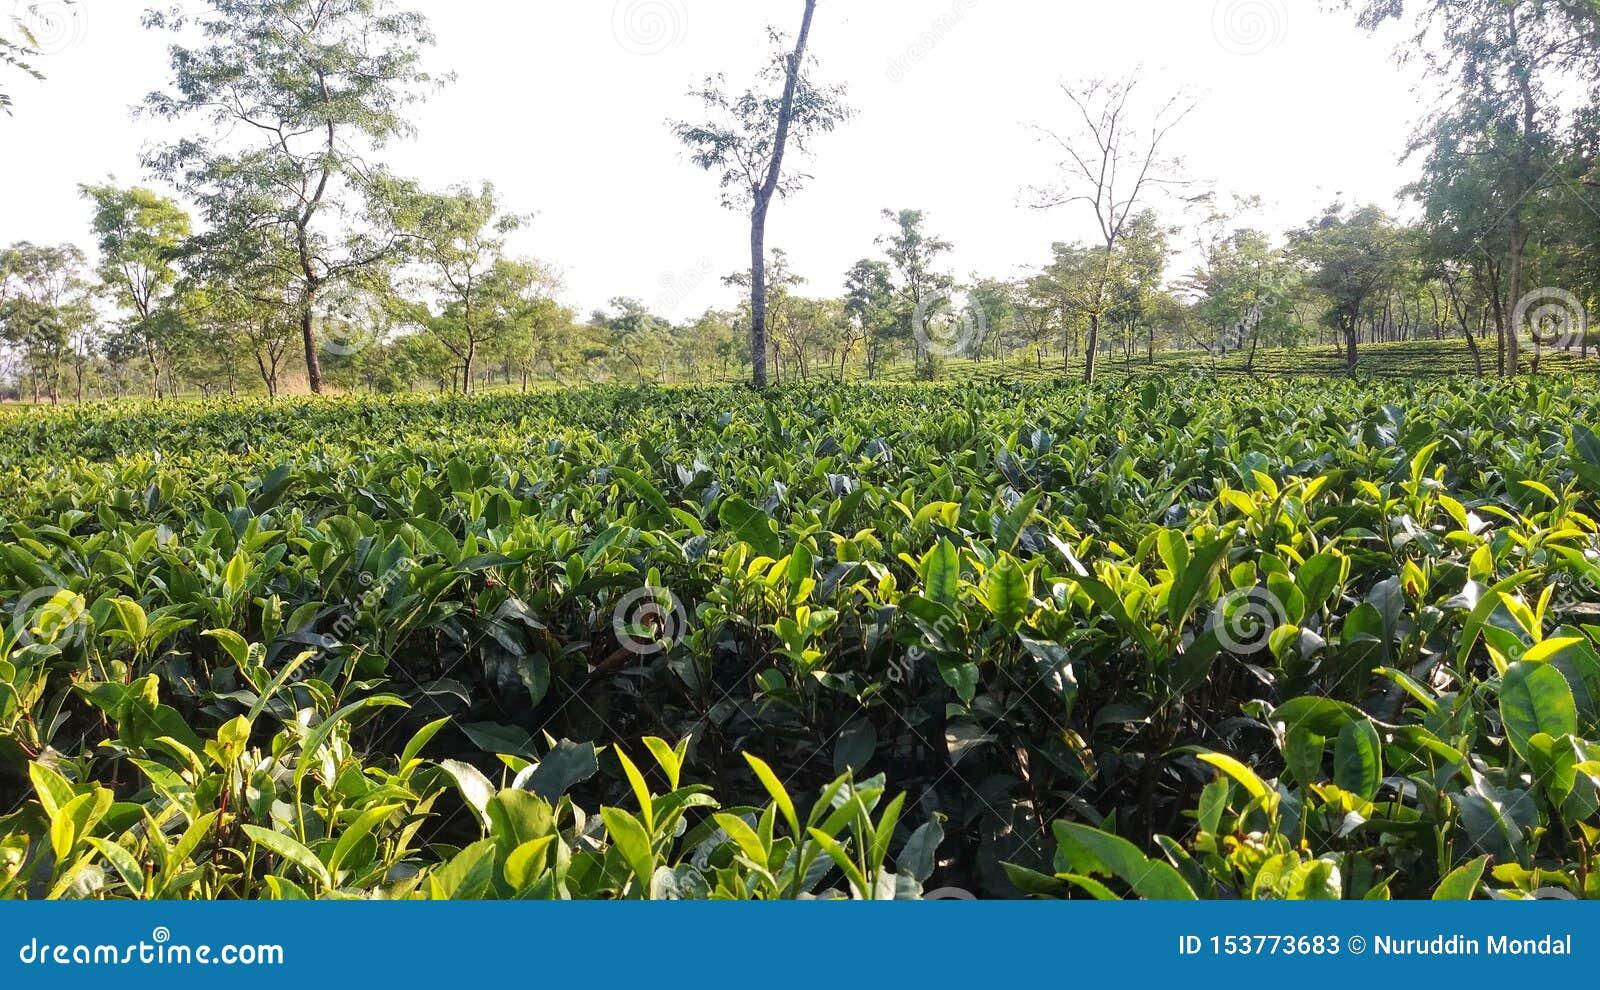 Green Tea Garden and Some Trees